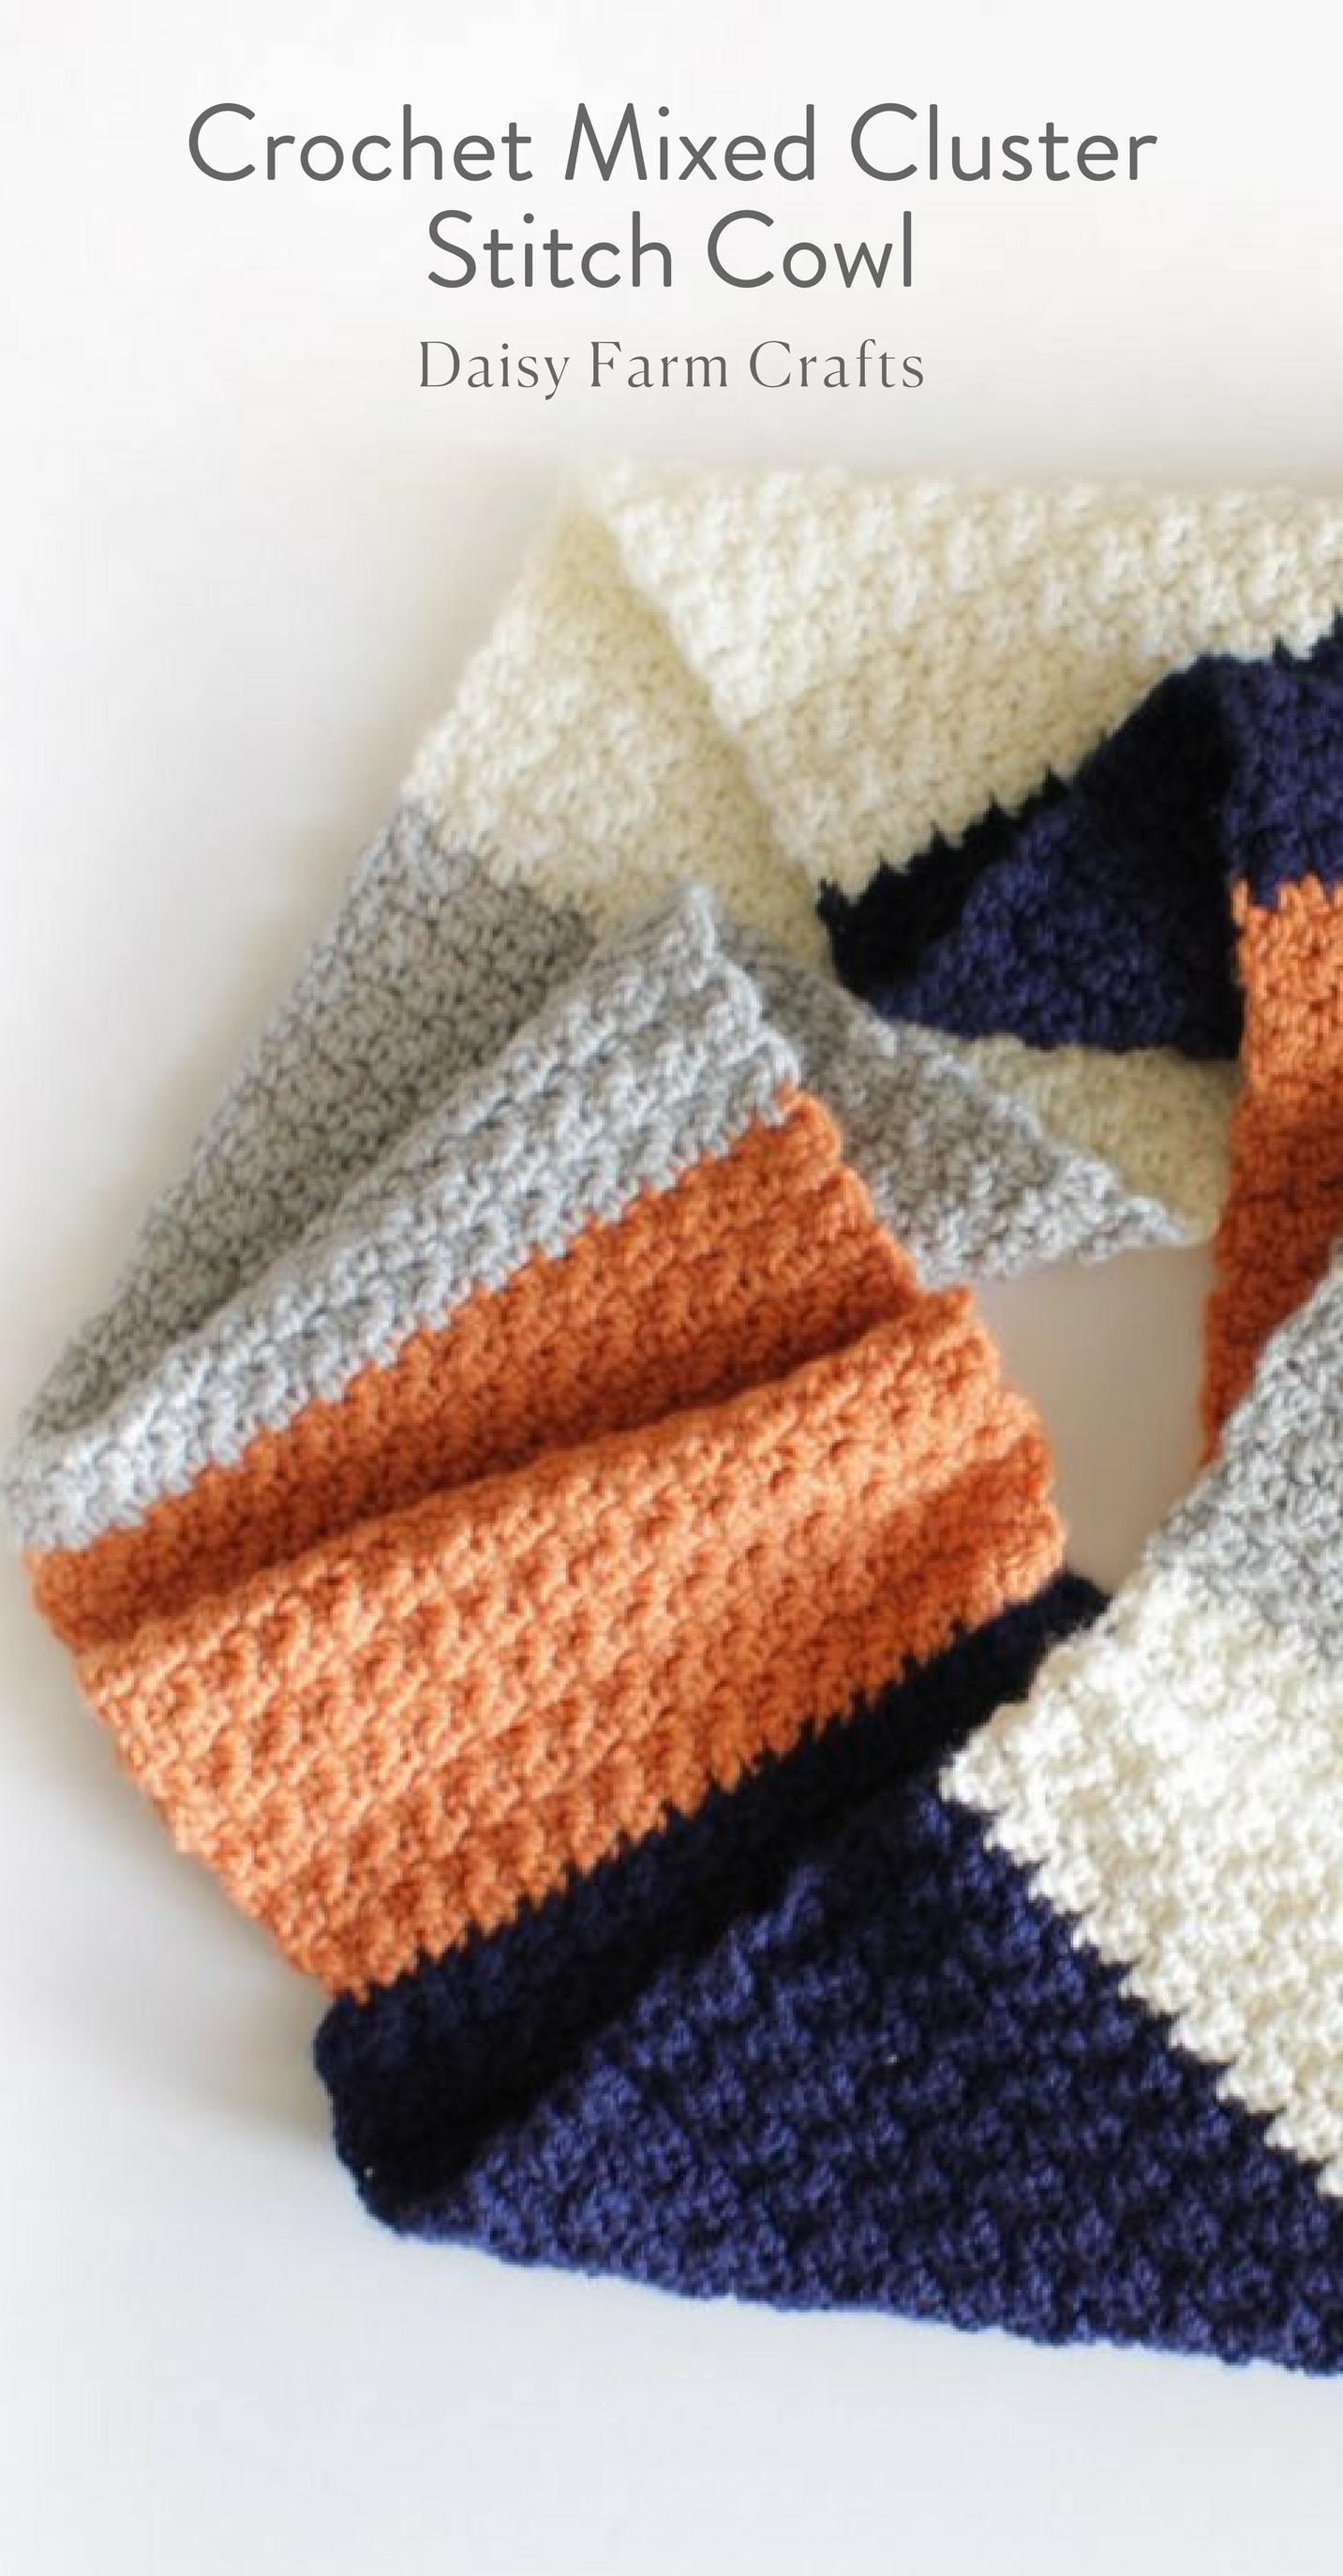 Free Pattern - Crochet Mixed Cluster Stitch Cowl   Crochet ...